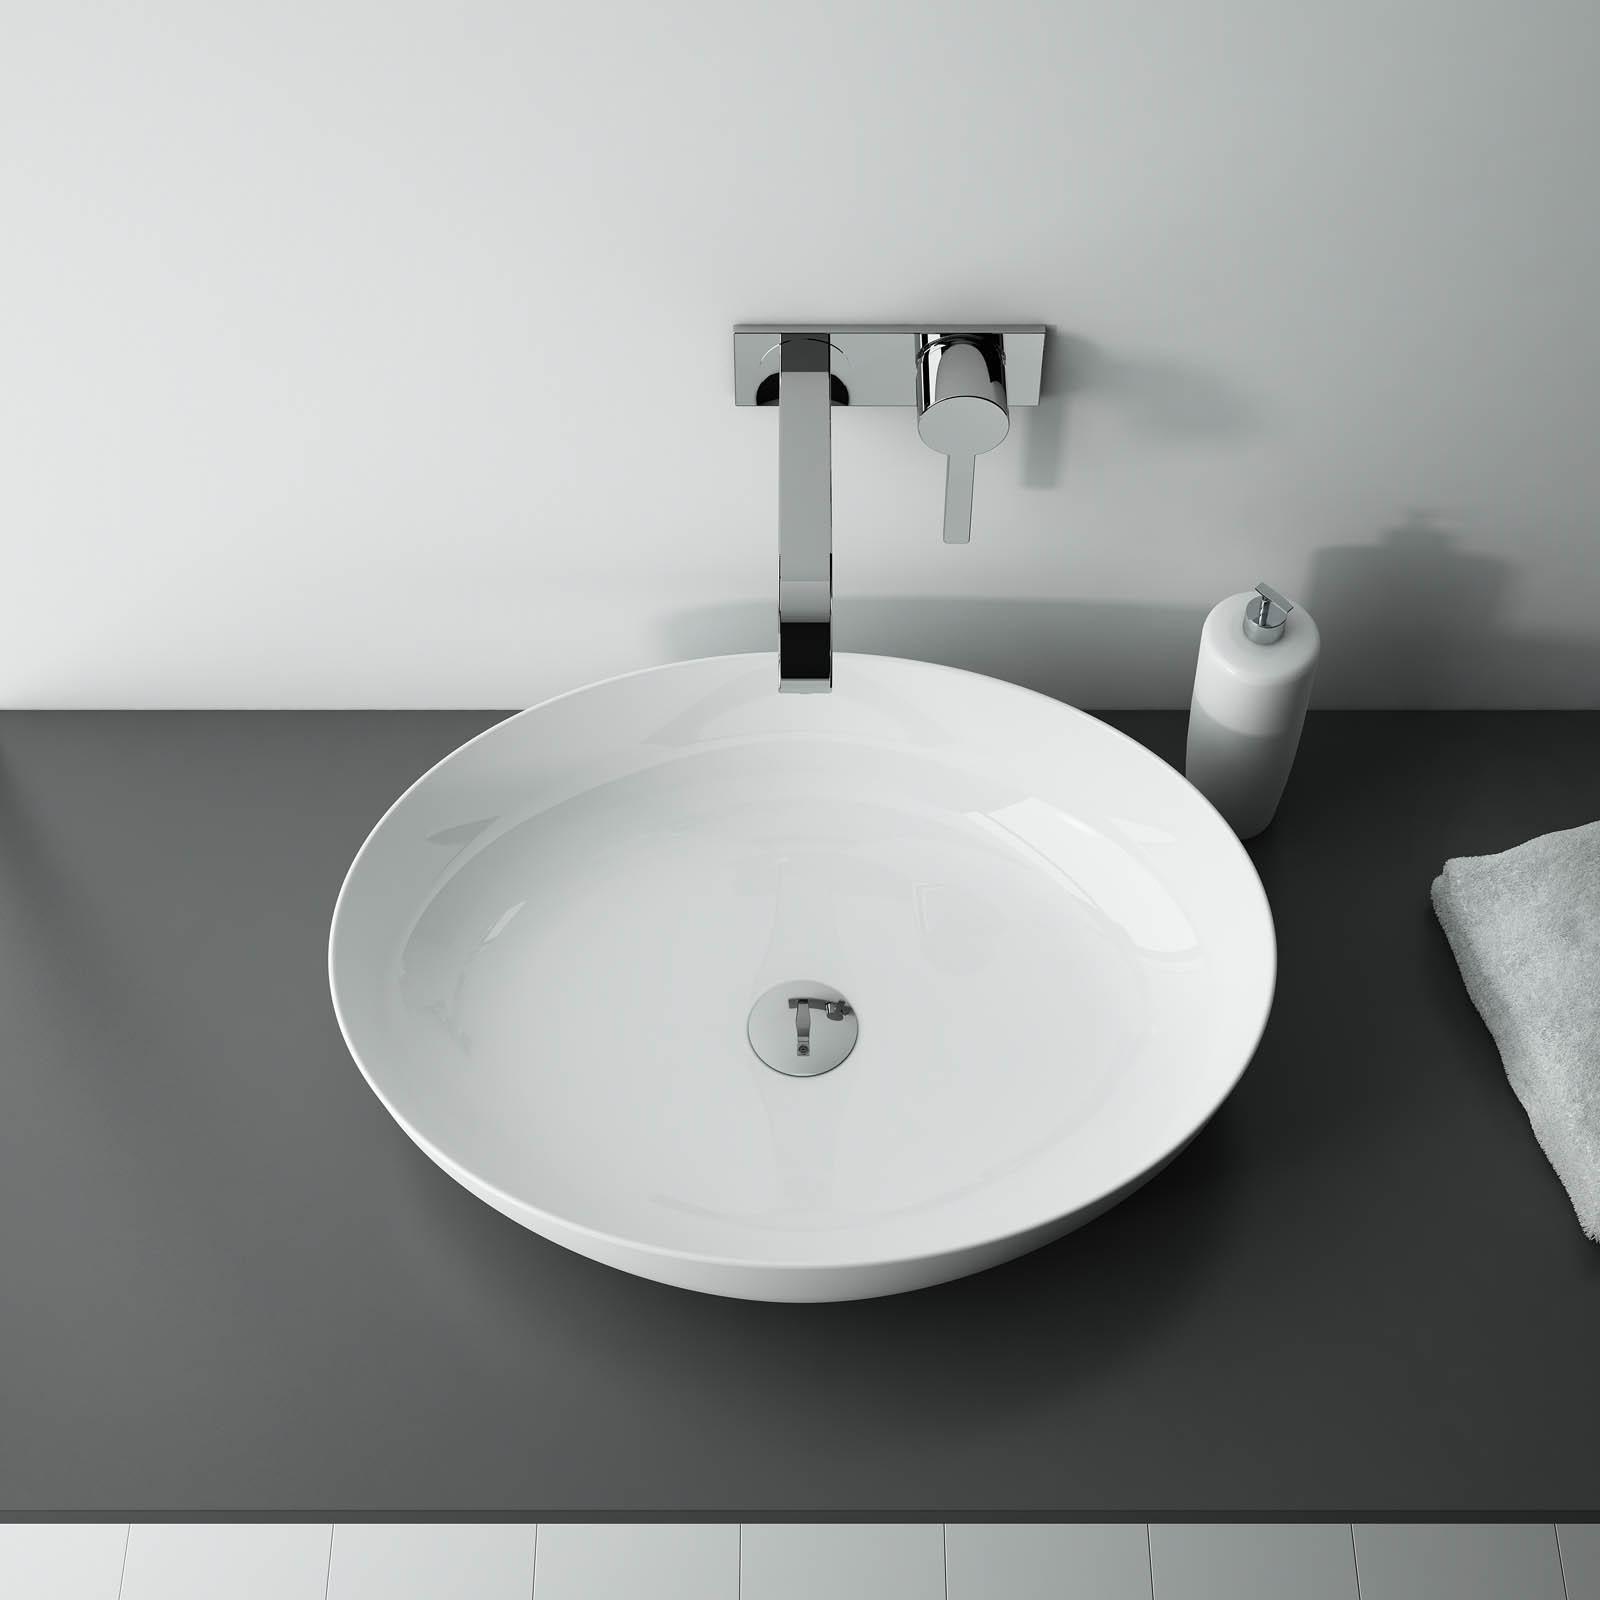 Umývadlo na dosku BLANCHE 52 x 39,5 cm | LOTOSAN Kúpeľne a Interiér